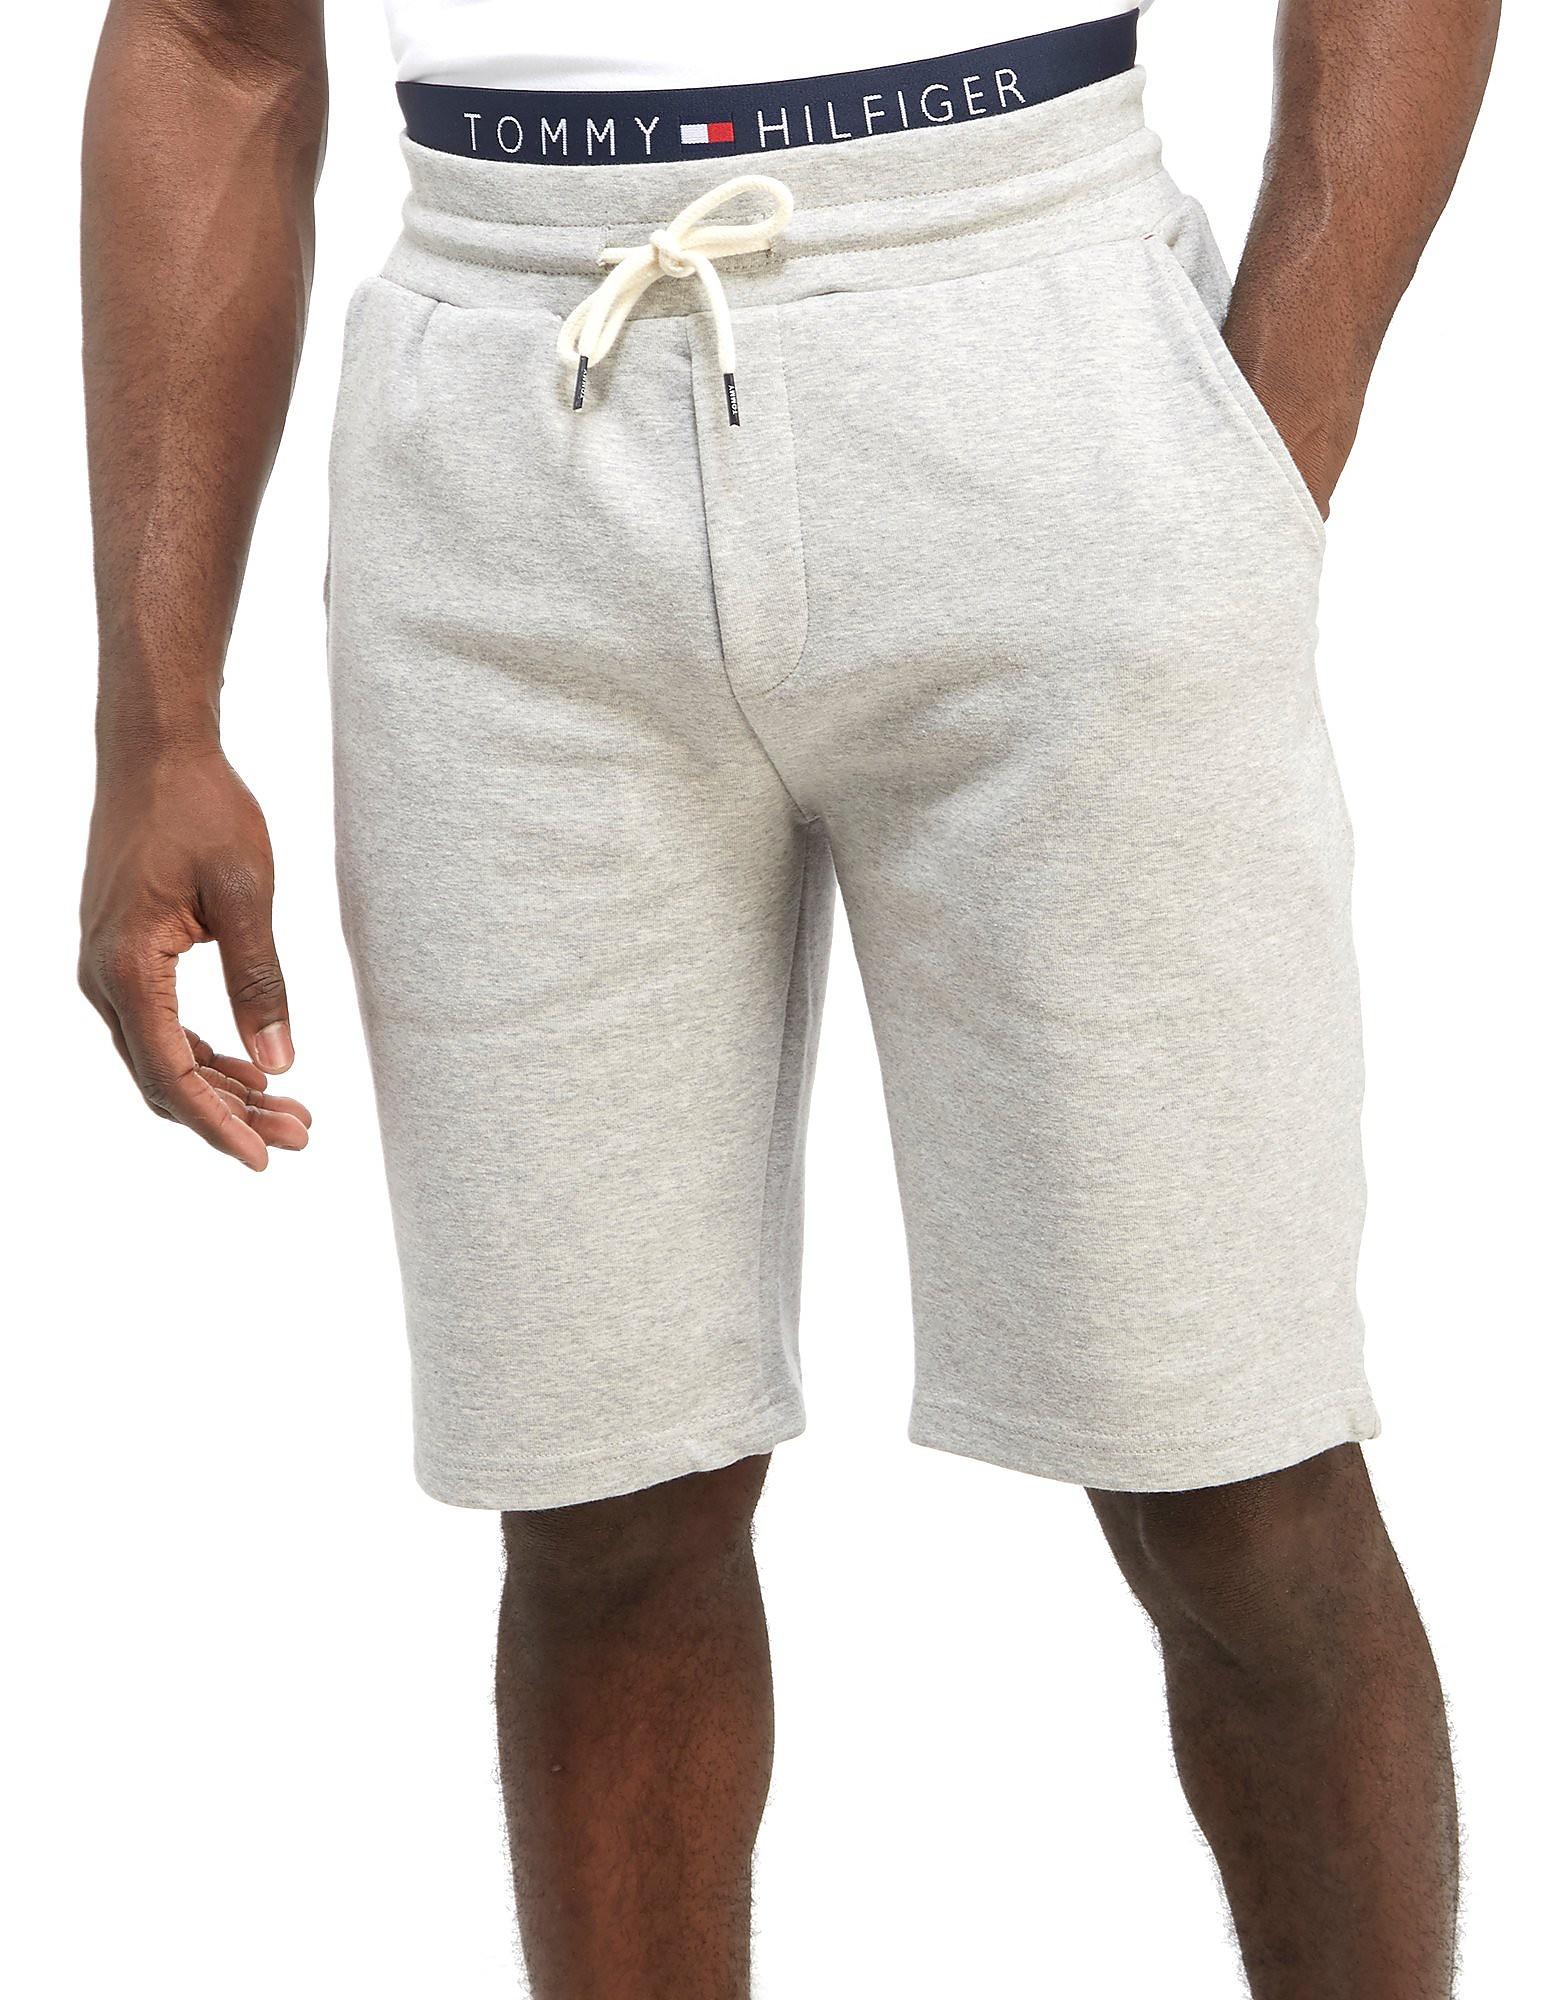 Tommy Hilfiger Fleece Shorts